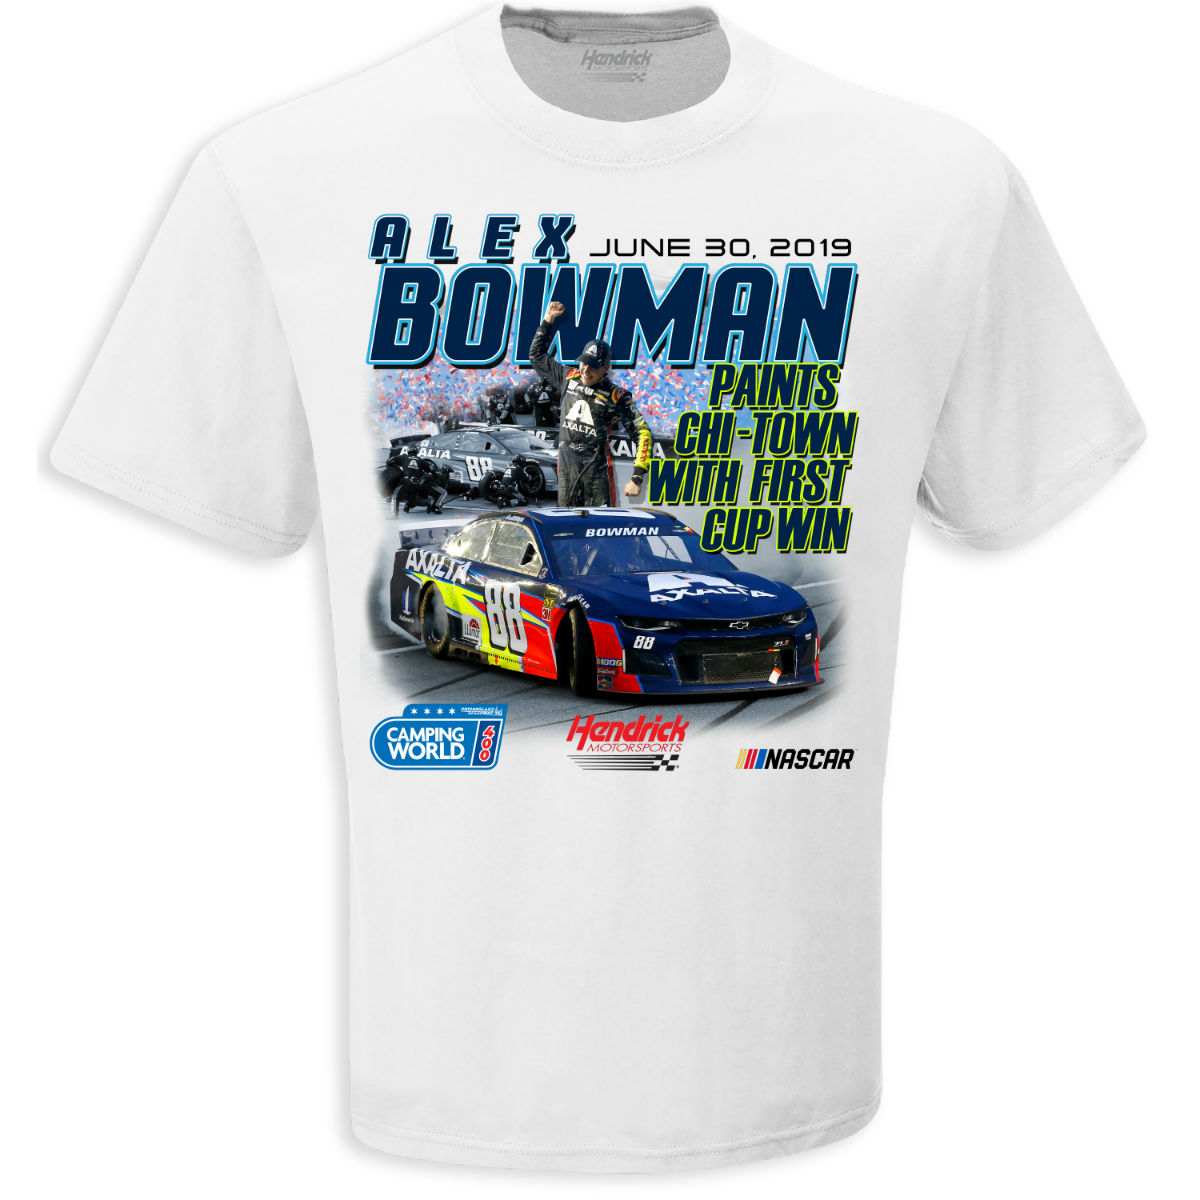 Alex Bowman NASCAR Camping World 400 Race Win T-shirt